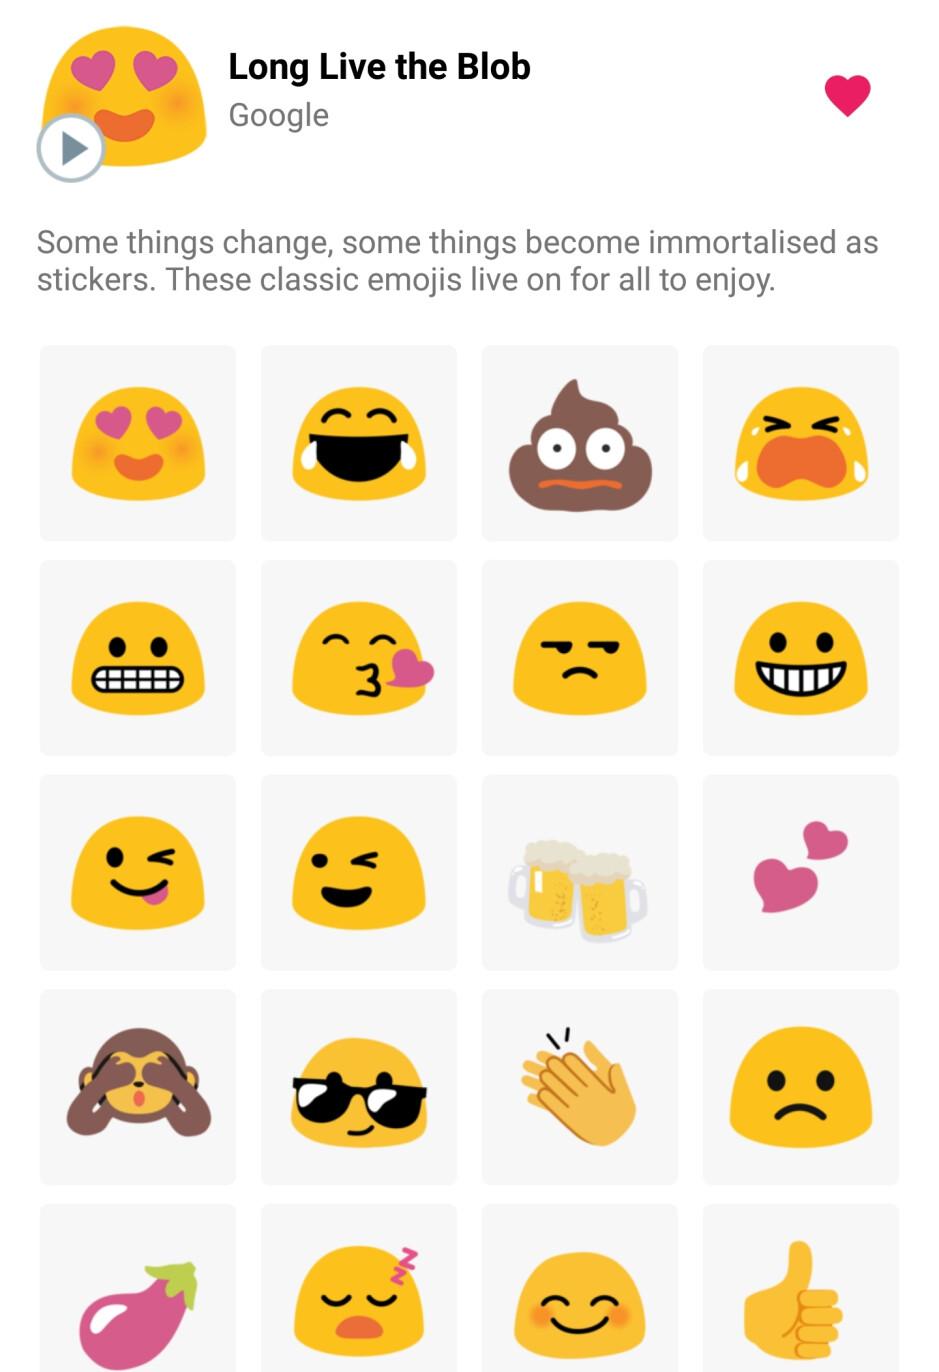 Heartwarming: Google brings back the blob emoji